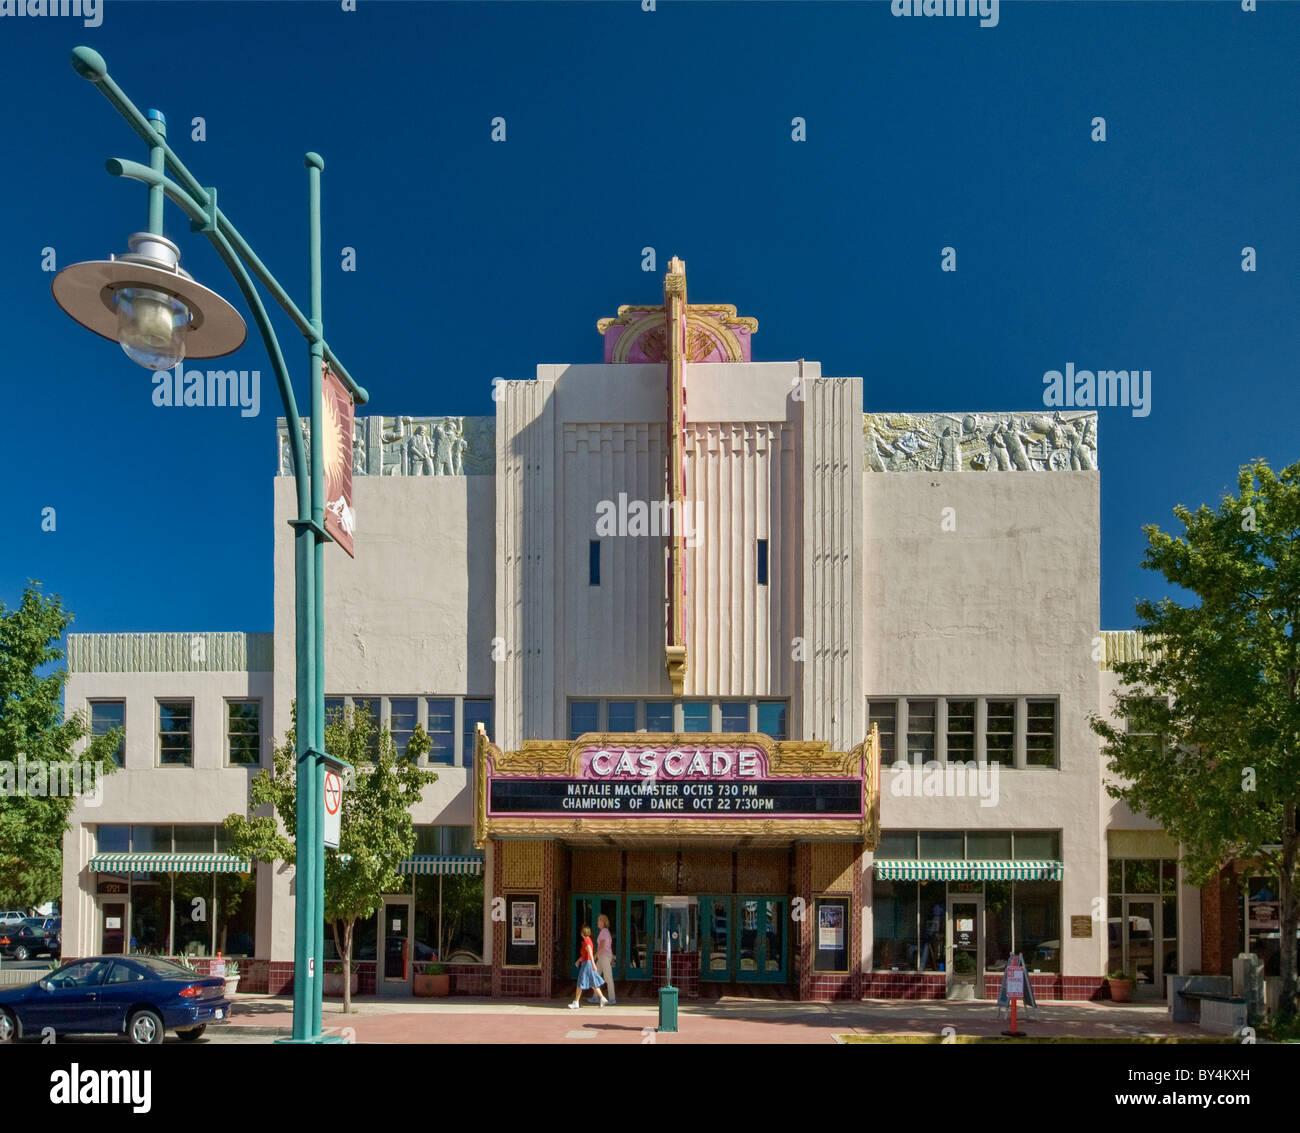 Art Deco Cascade Theater at Market Street in Redding, California, USA - Stock Image